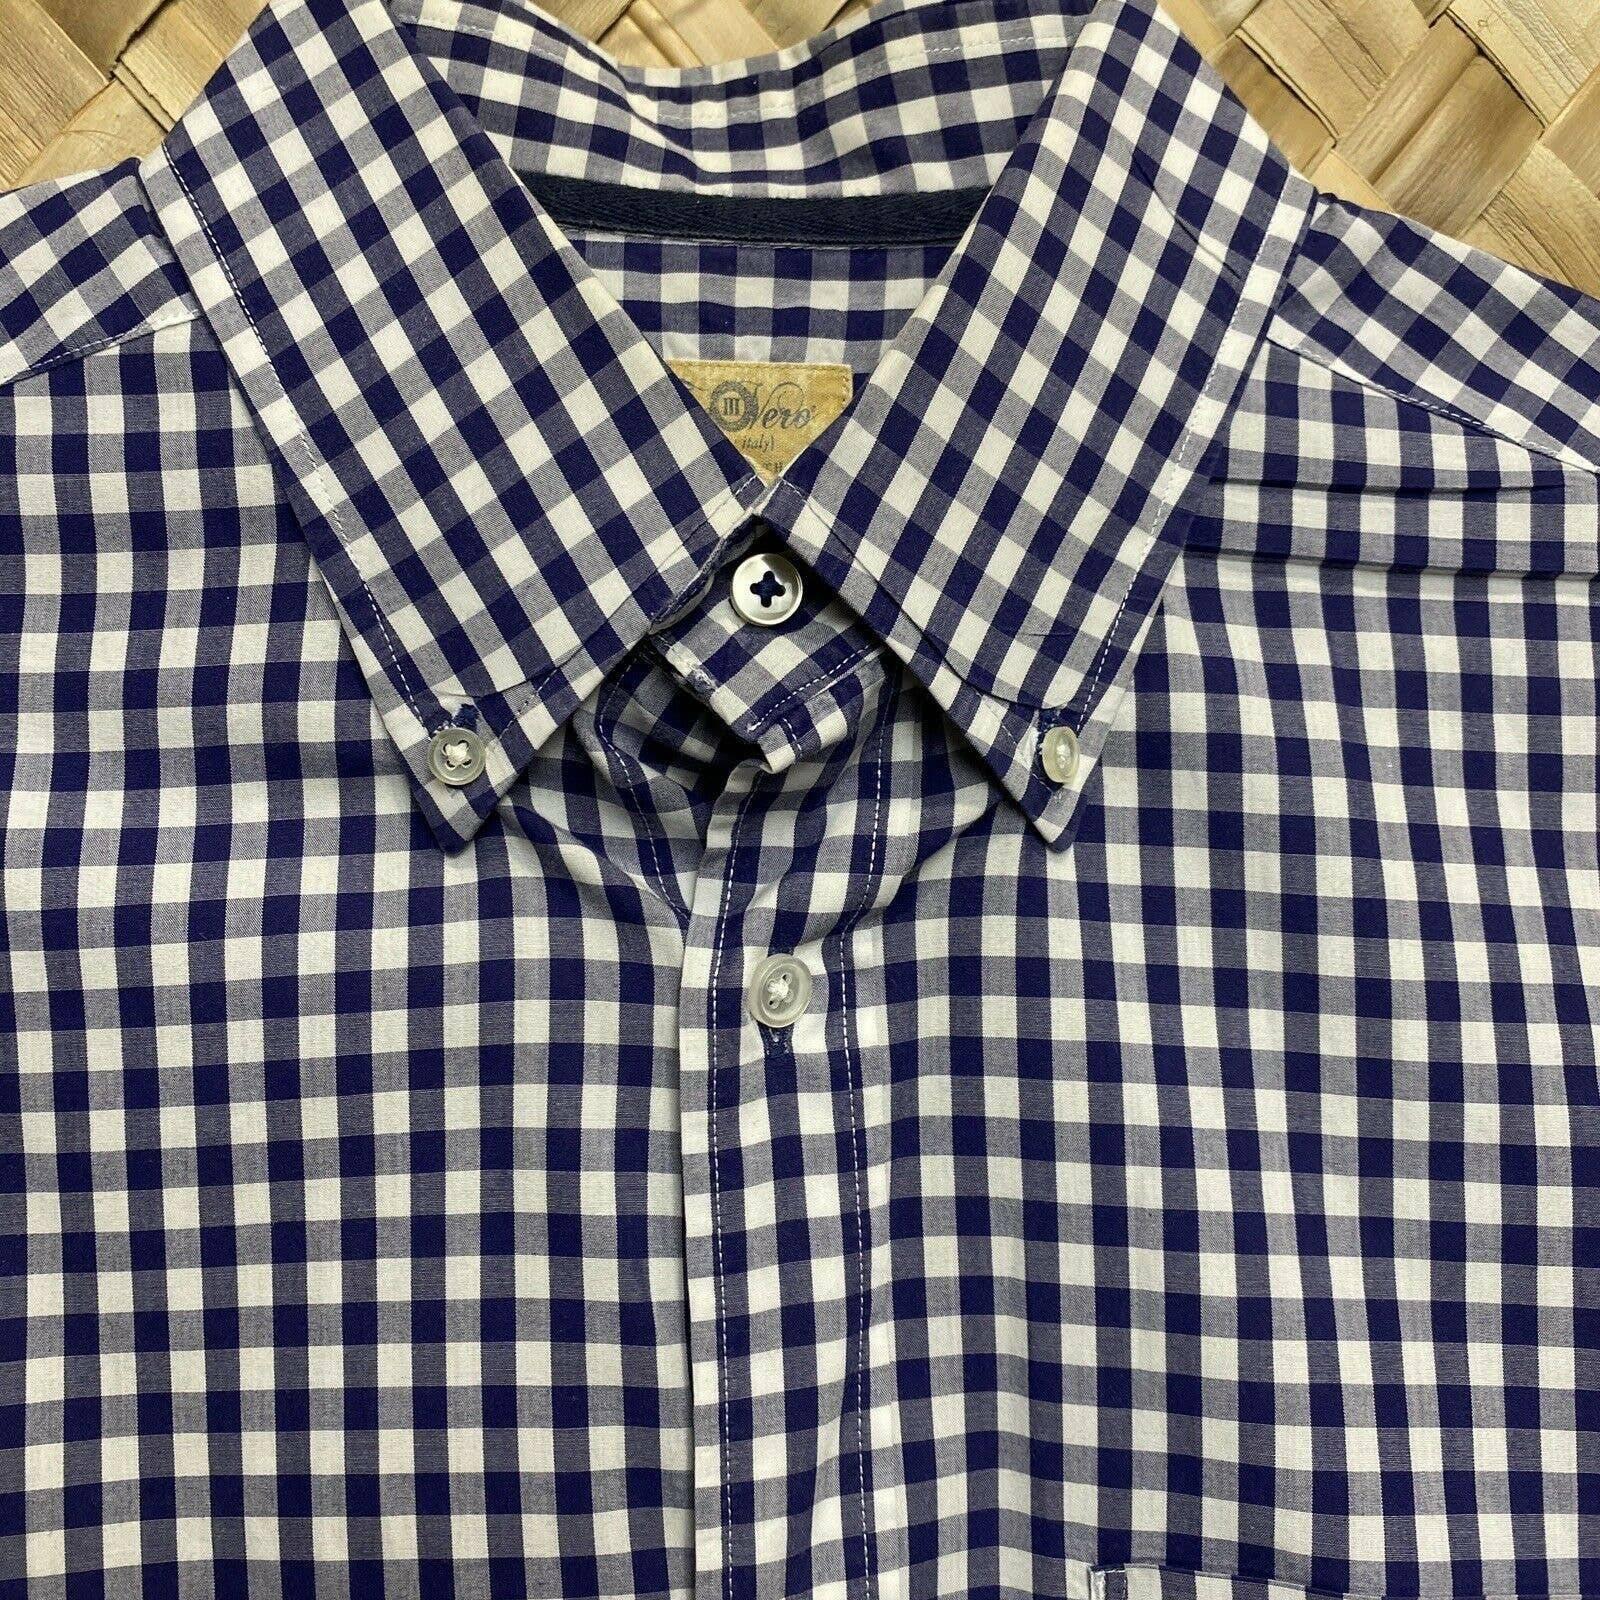 Tre Vero Gingham Dress Shirt